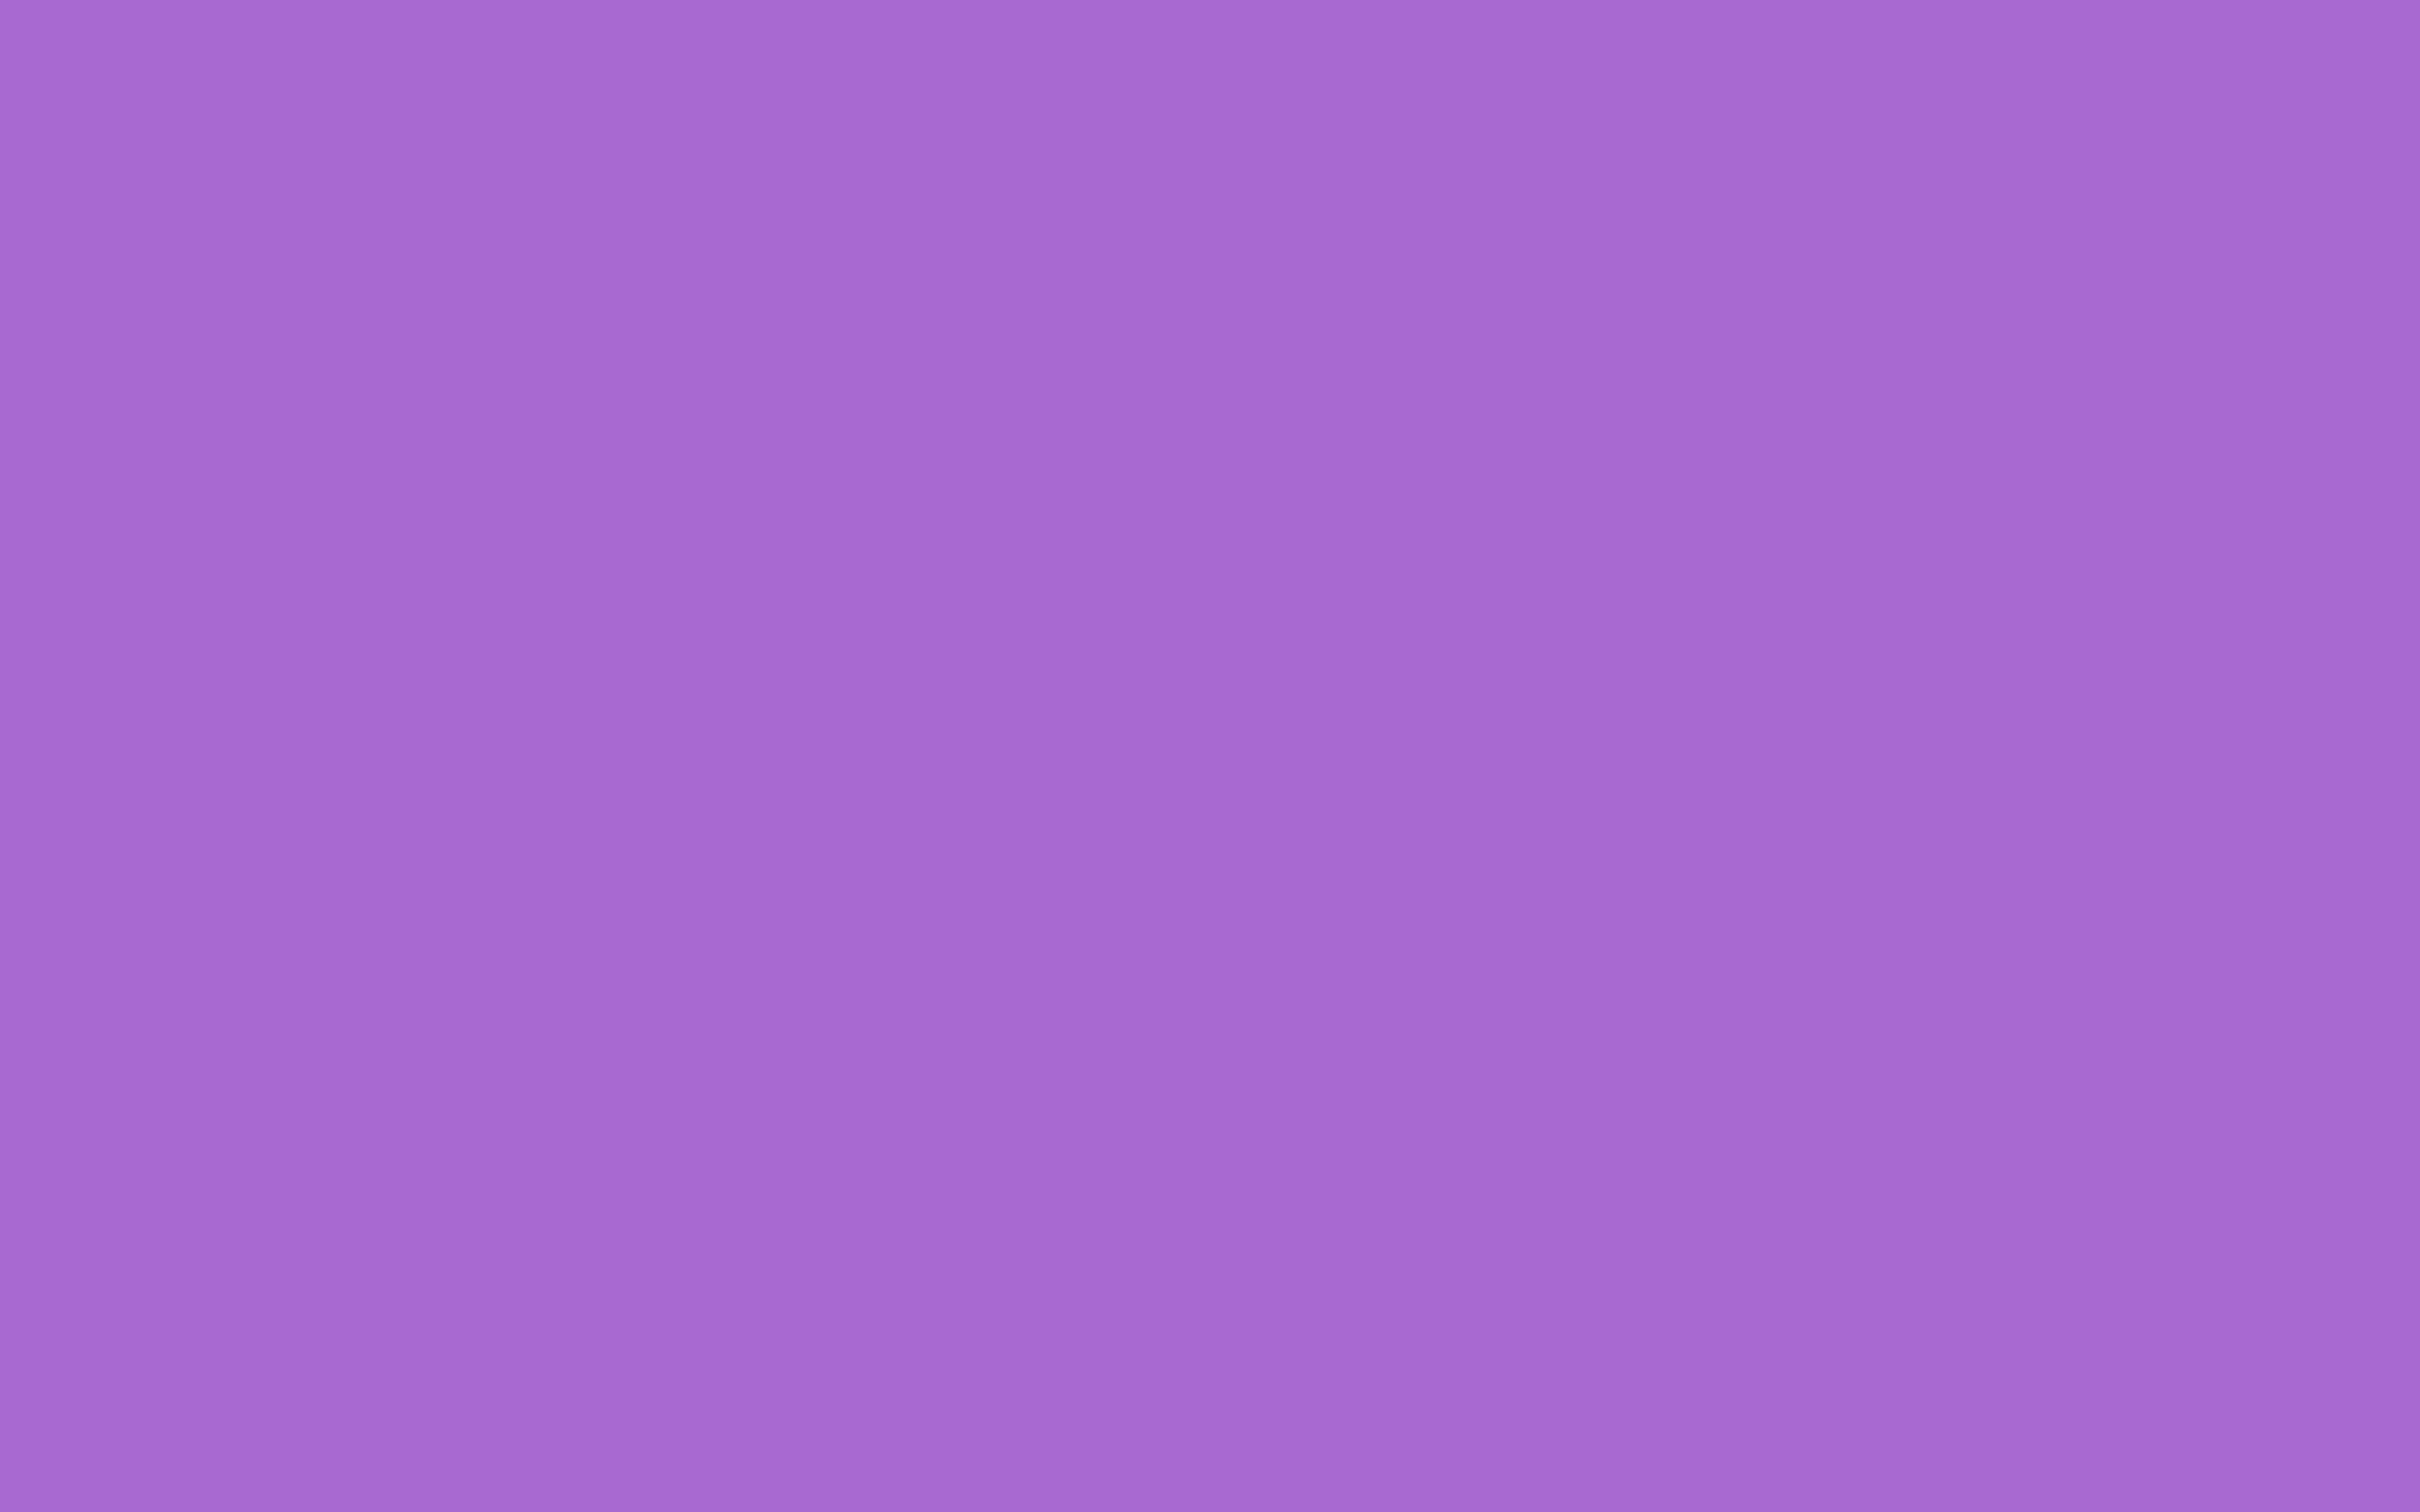 2560x1600 Rich Lavender Solid Color Background